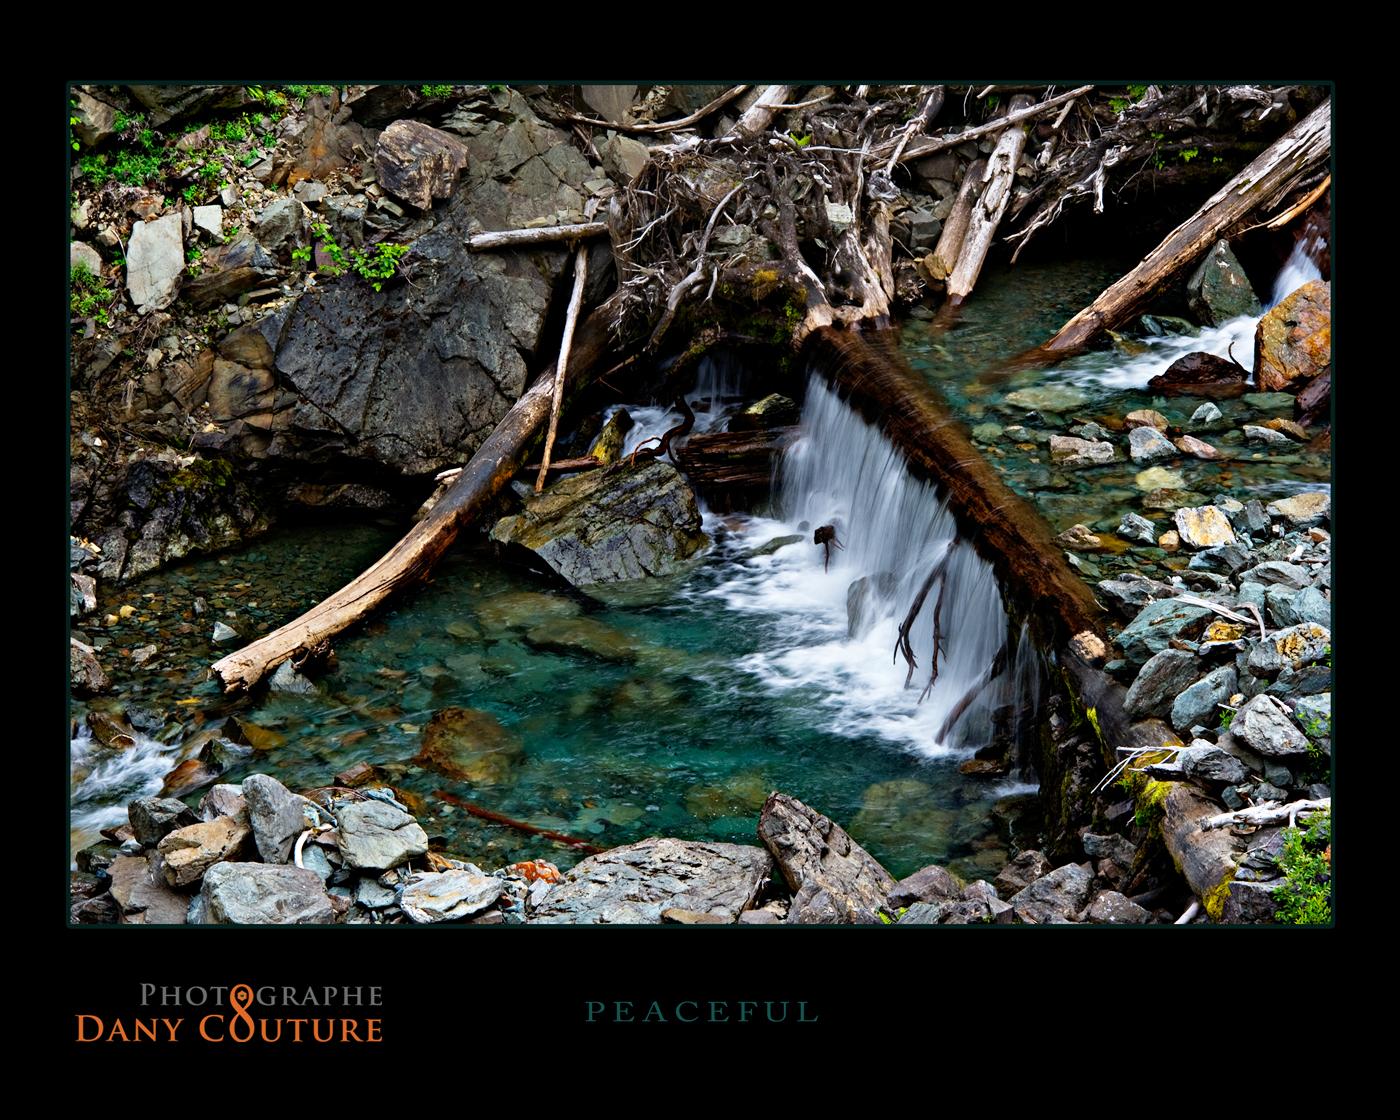 Peaceful©DC